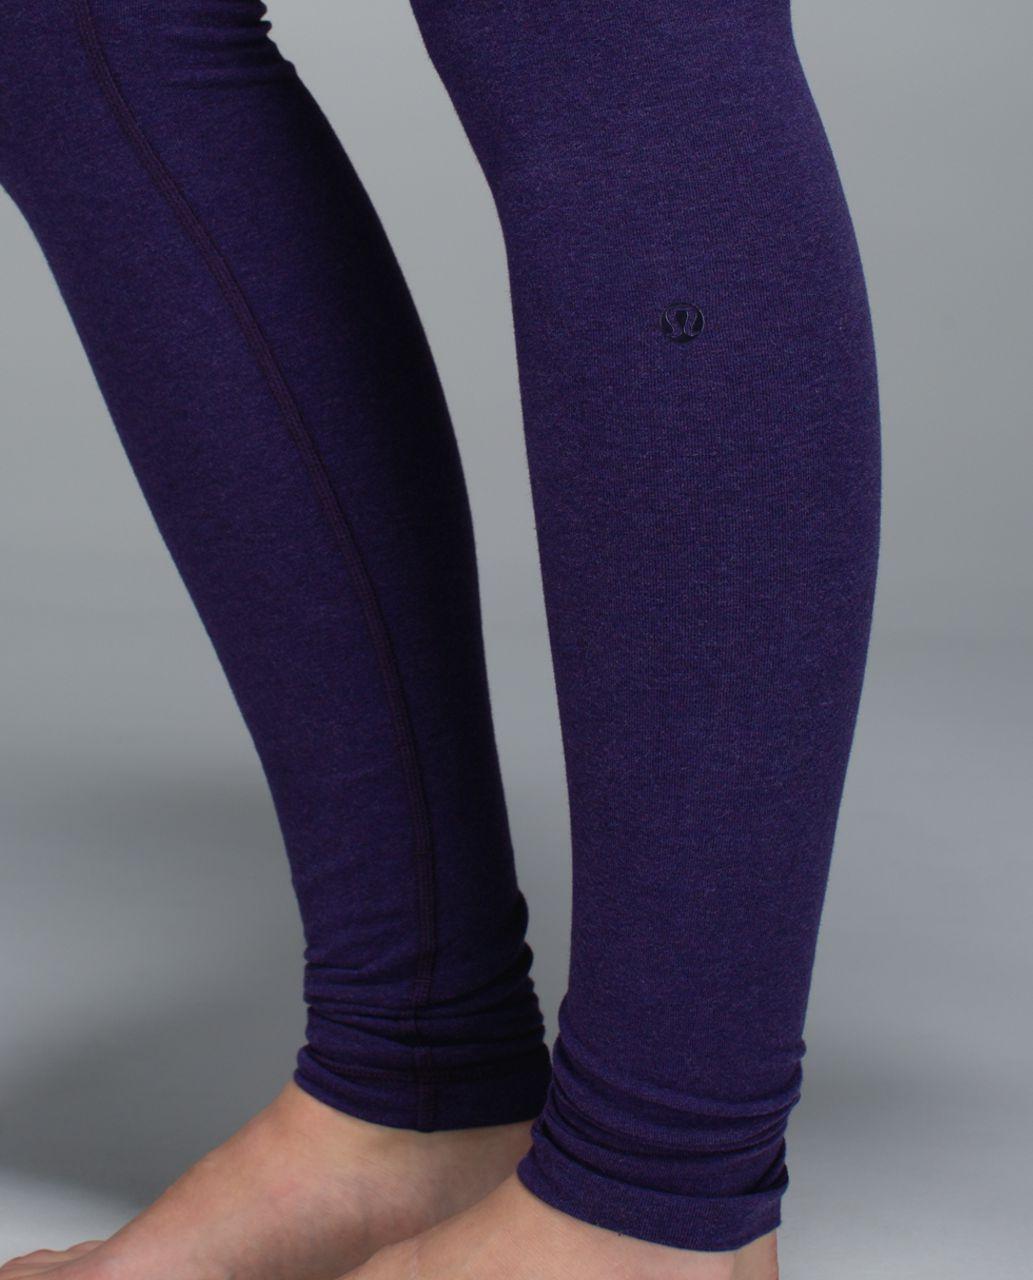 Lululemon Wunder Under Pant *Cotton (Roll Down) - Heathered Black Grape